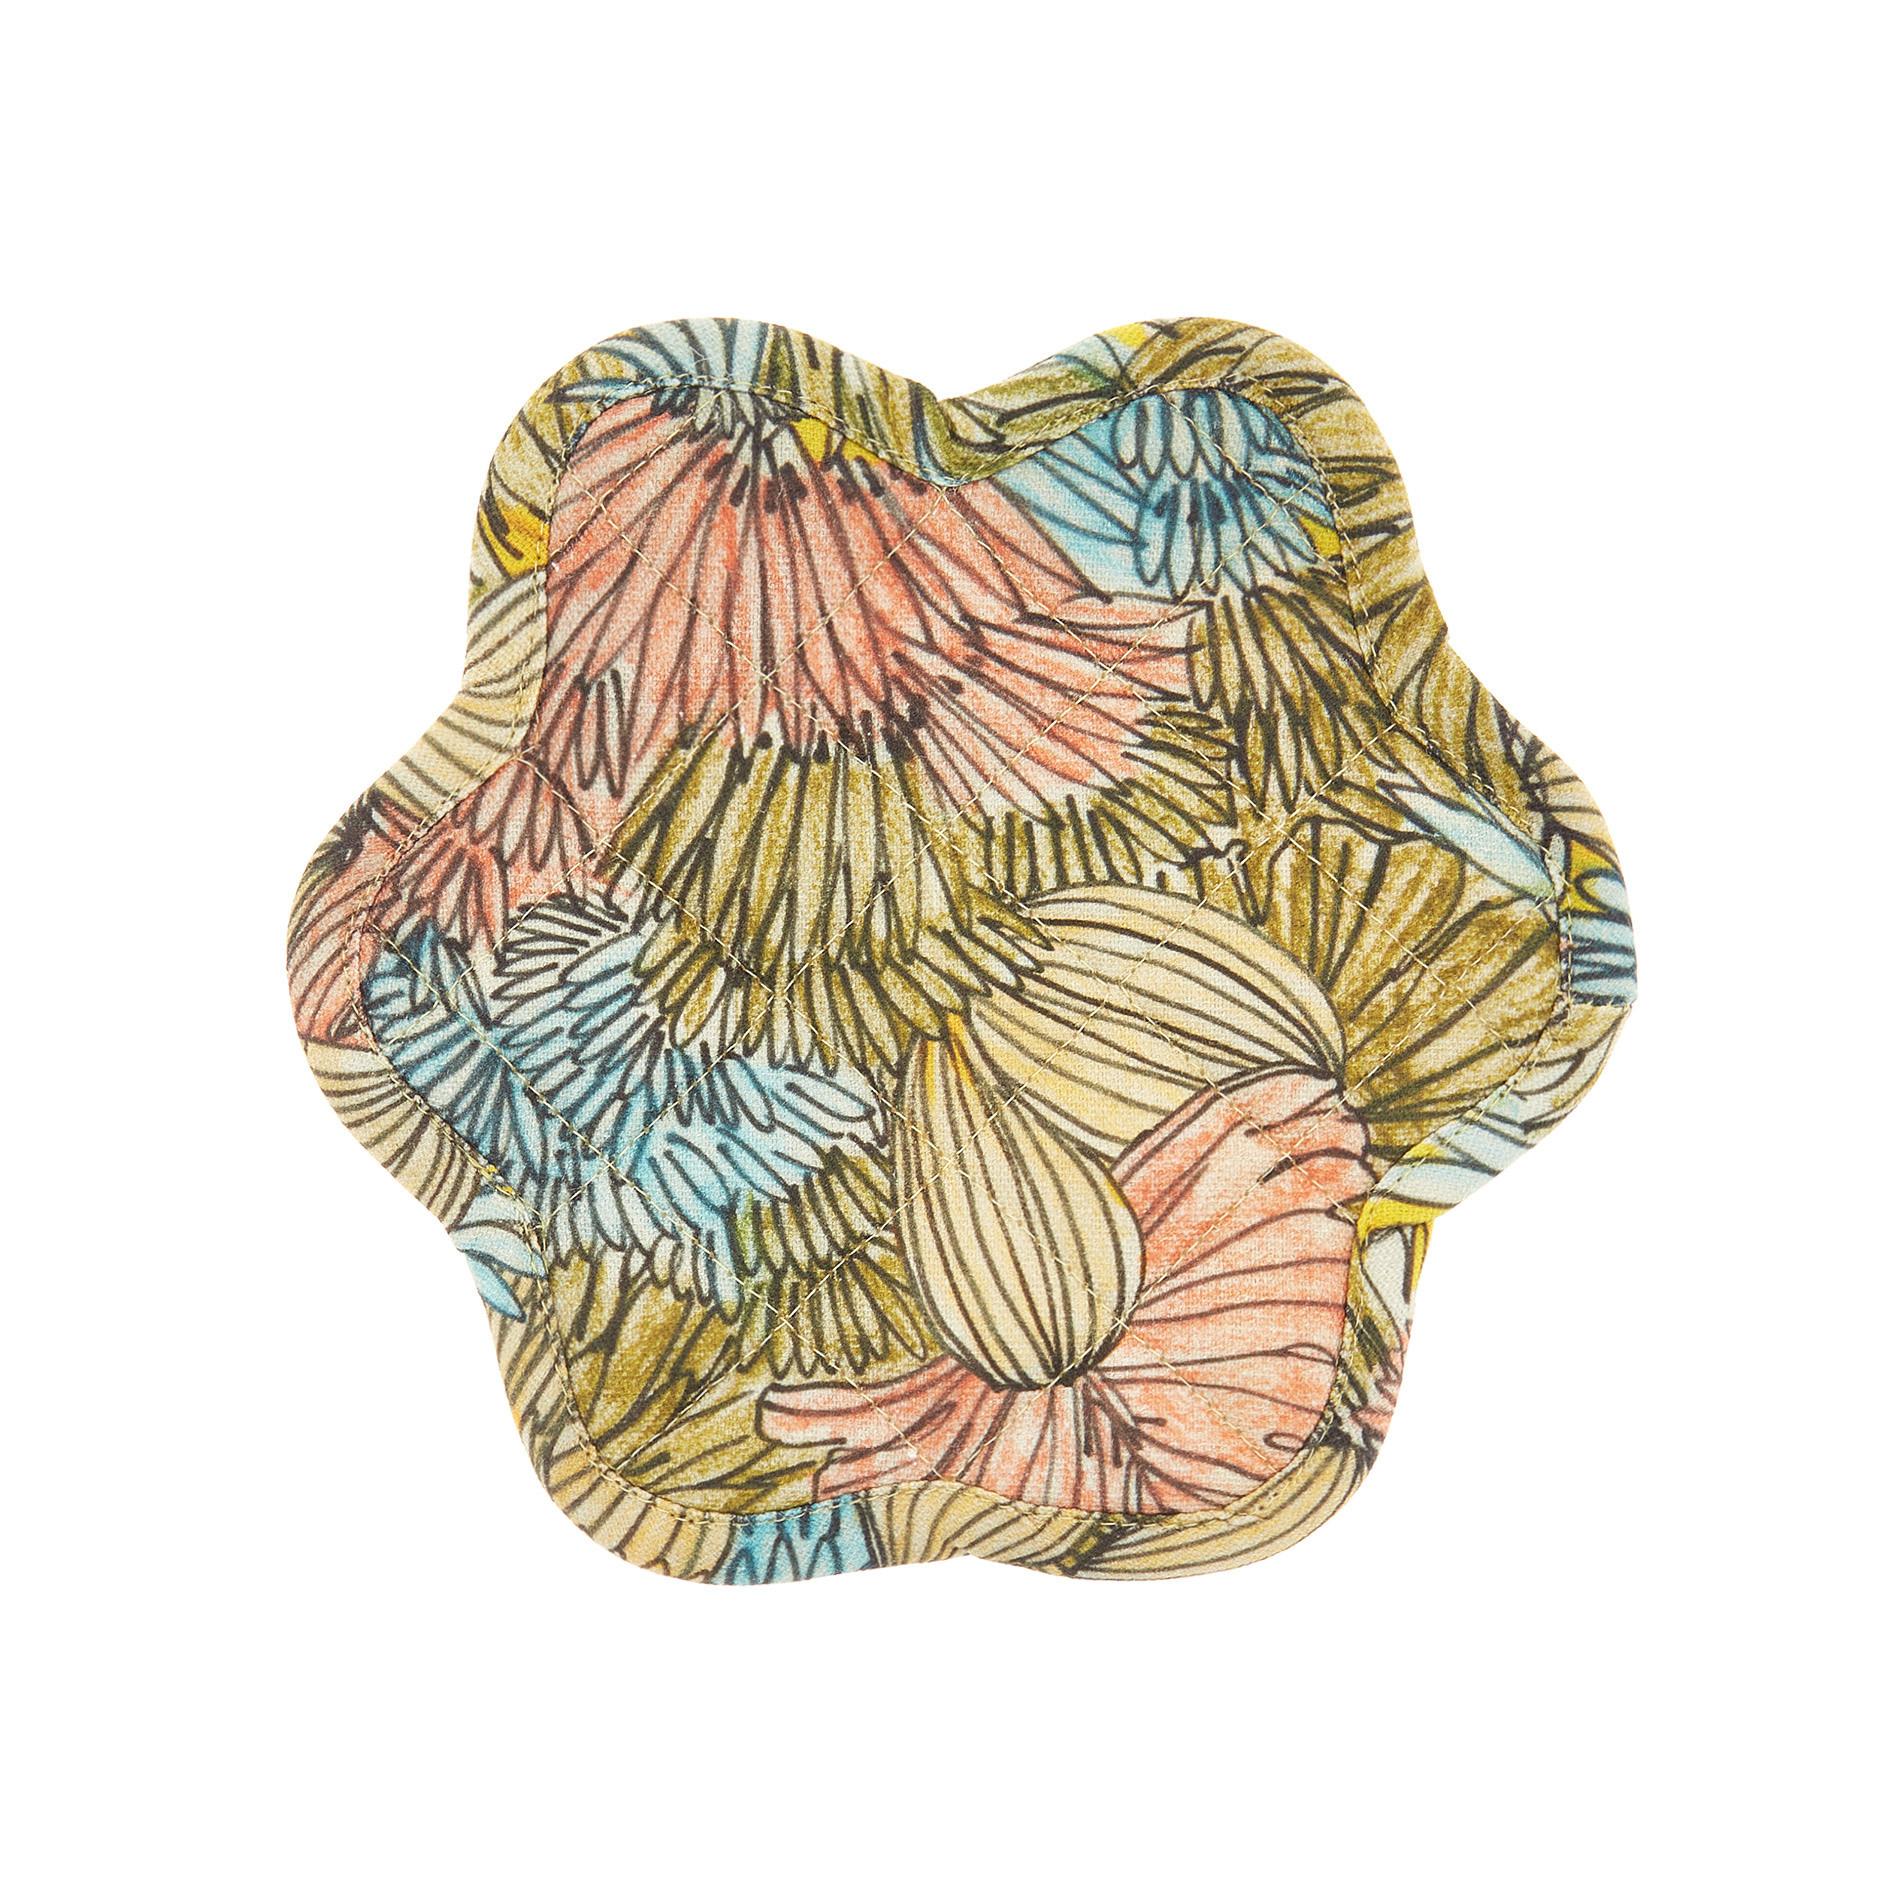 Presina puro cotone organico stampa cactus, Multicolor, large image number 0